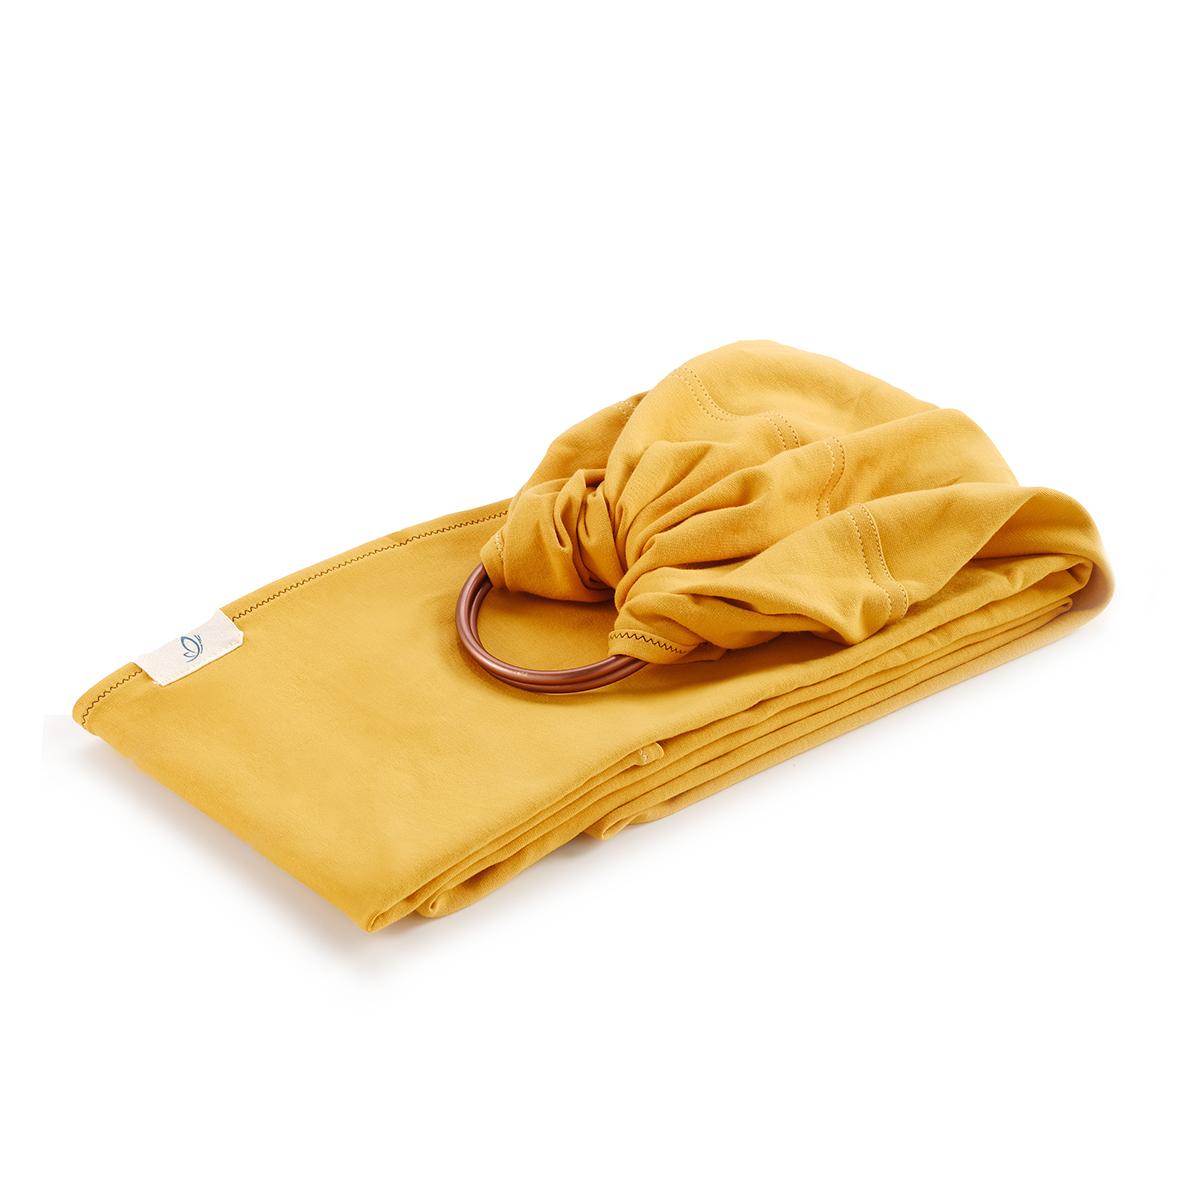 Porte bébé Echarpe My Sling Jersey - Ambre Echarpe My Sling Jersey - Ambre